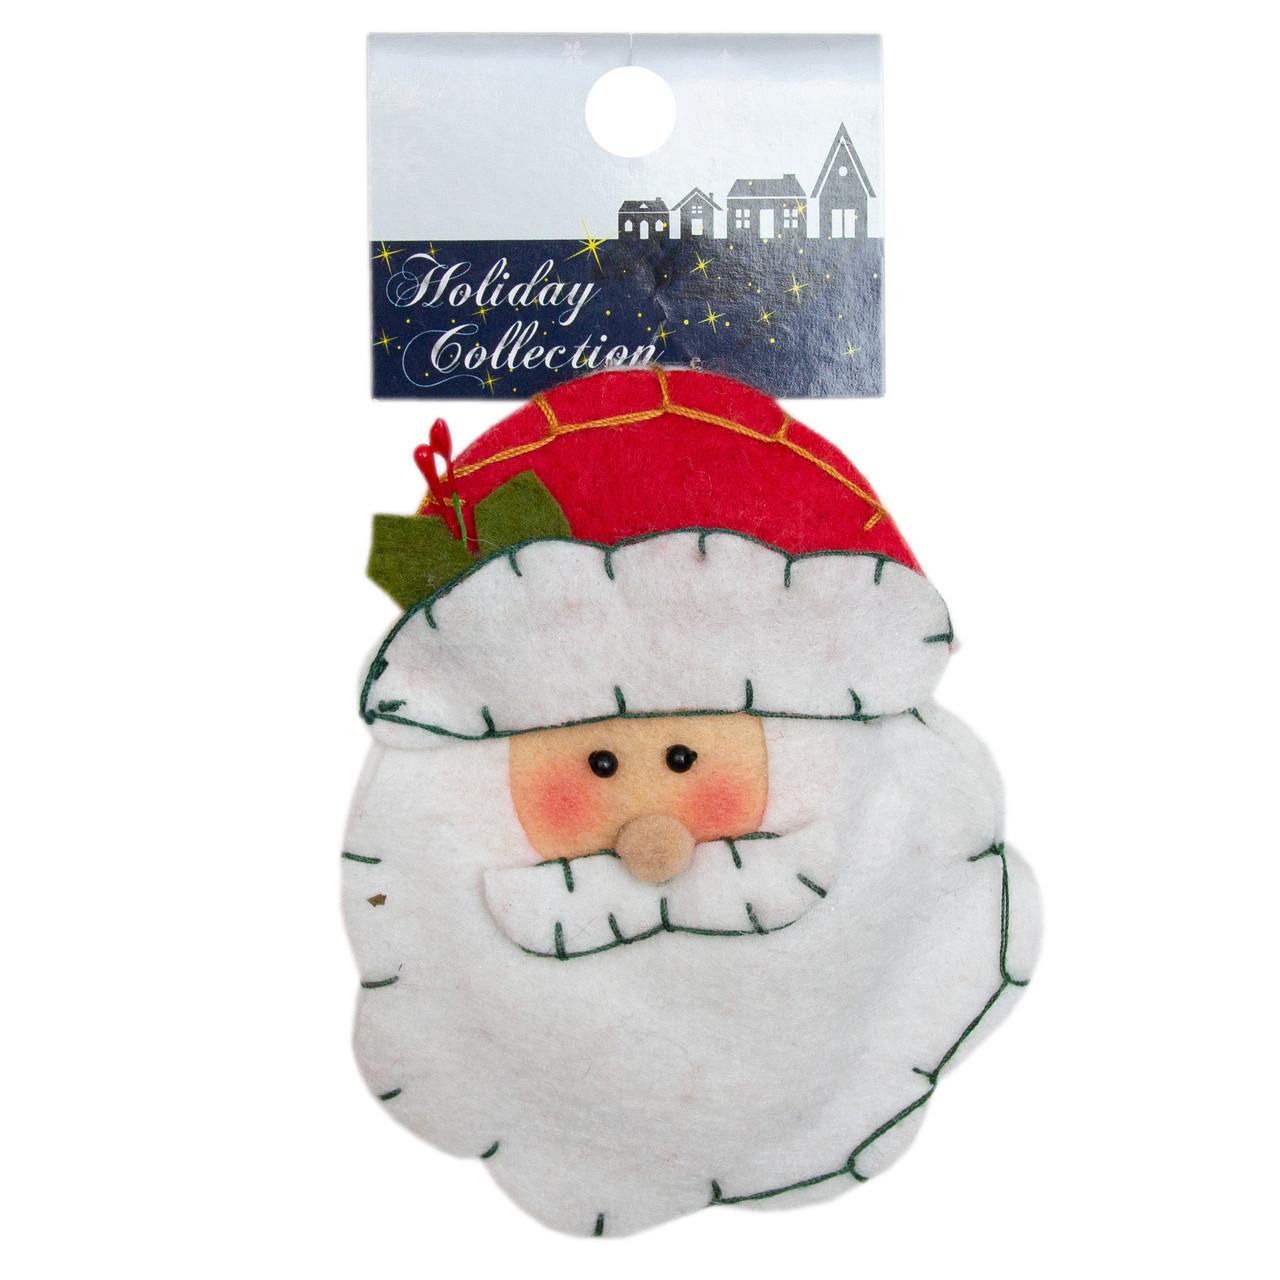 Елочная игрушка сувенирная фигурка из войлока, 10 см, лицо Деда Мороза, (000166-1)